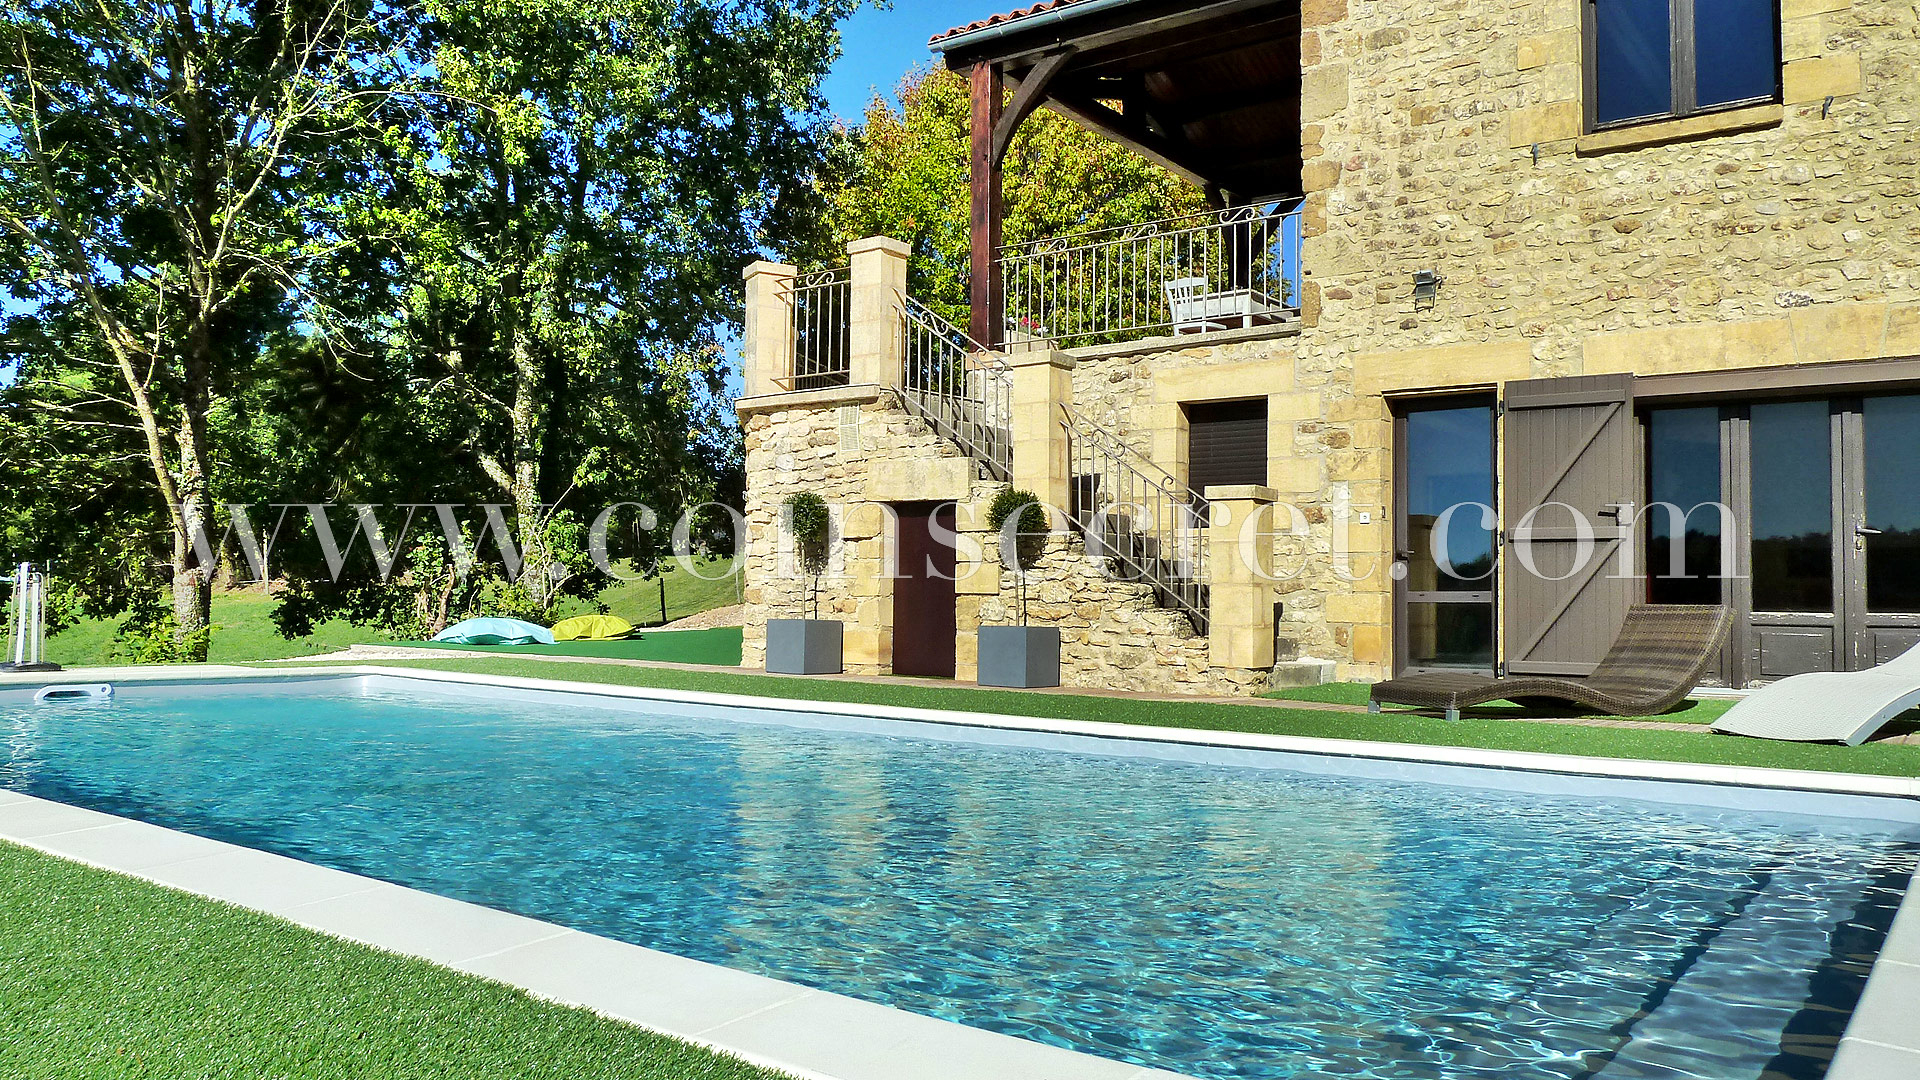 Location Maison Avec Piscine Proche Sarlat - Dordogne ... dedans Location Dordogne Piscine